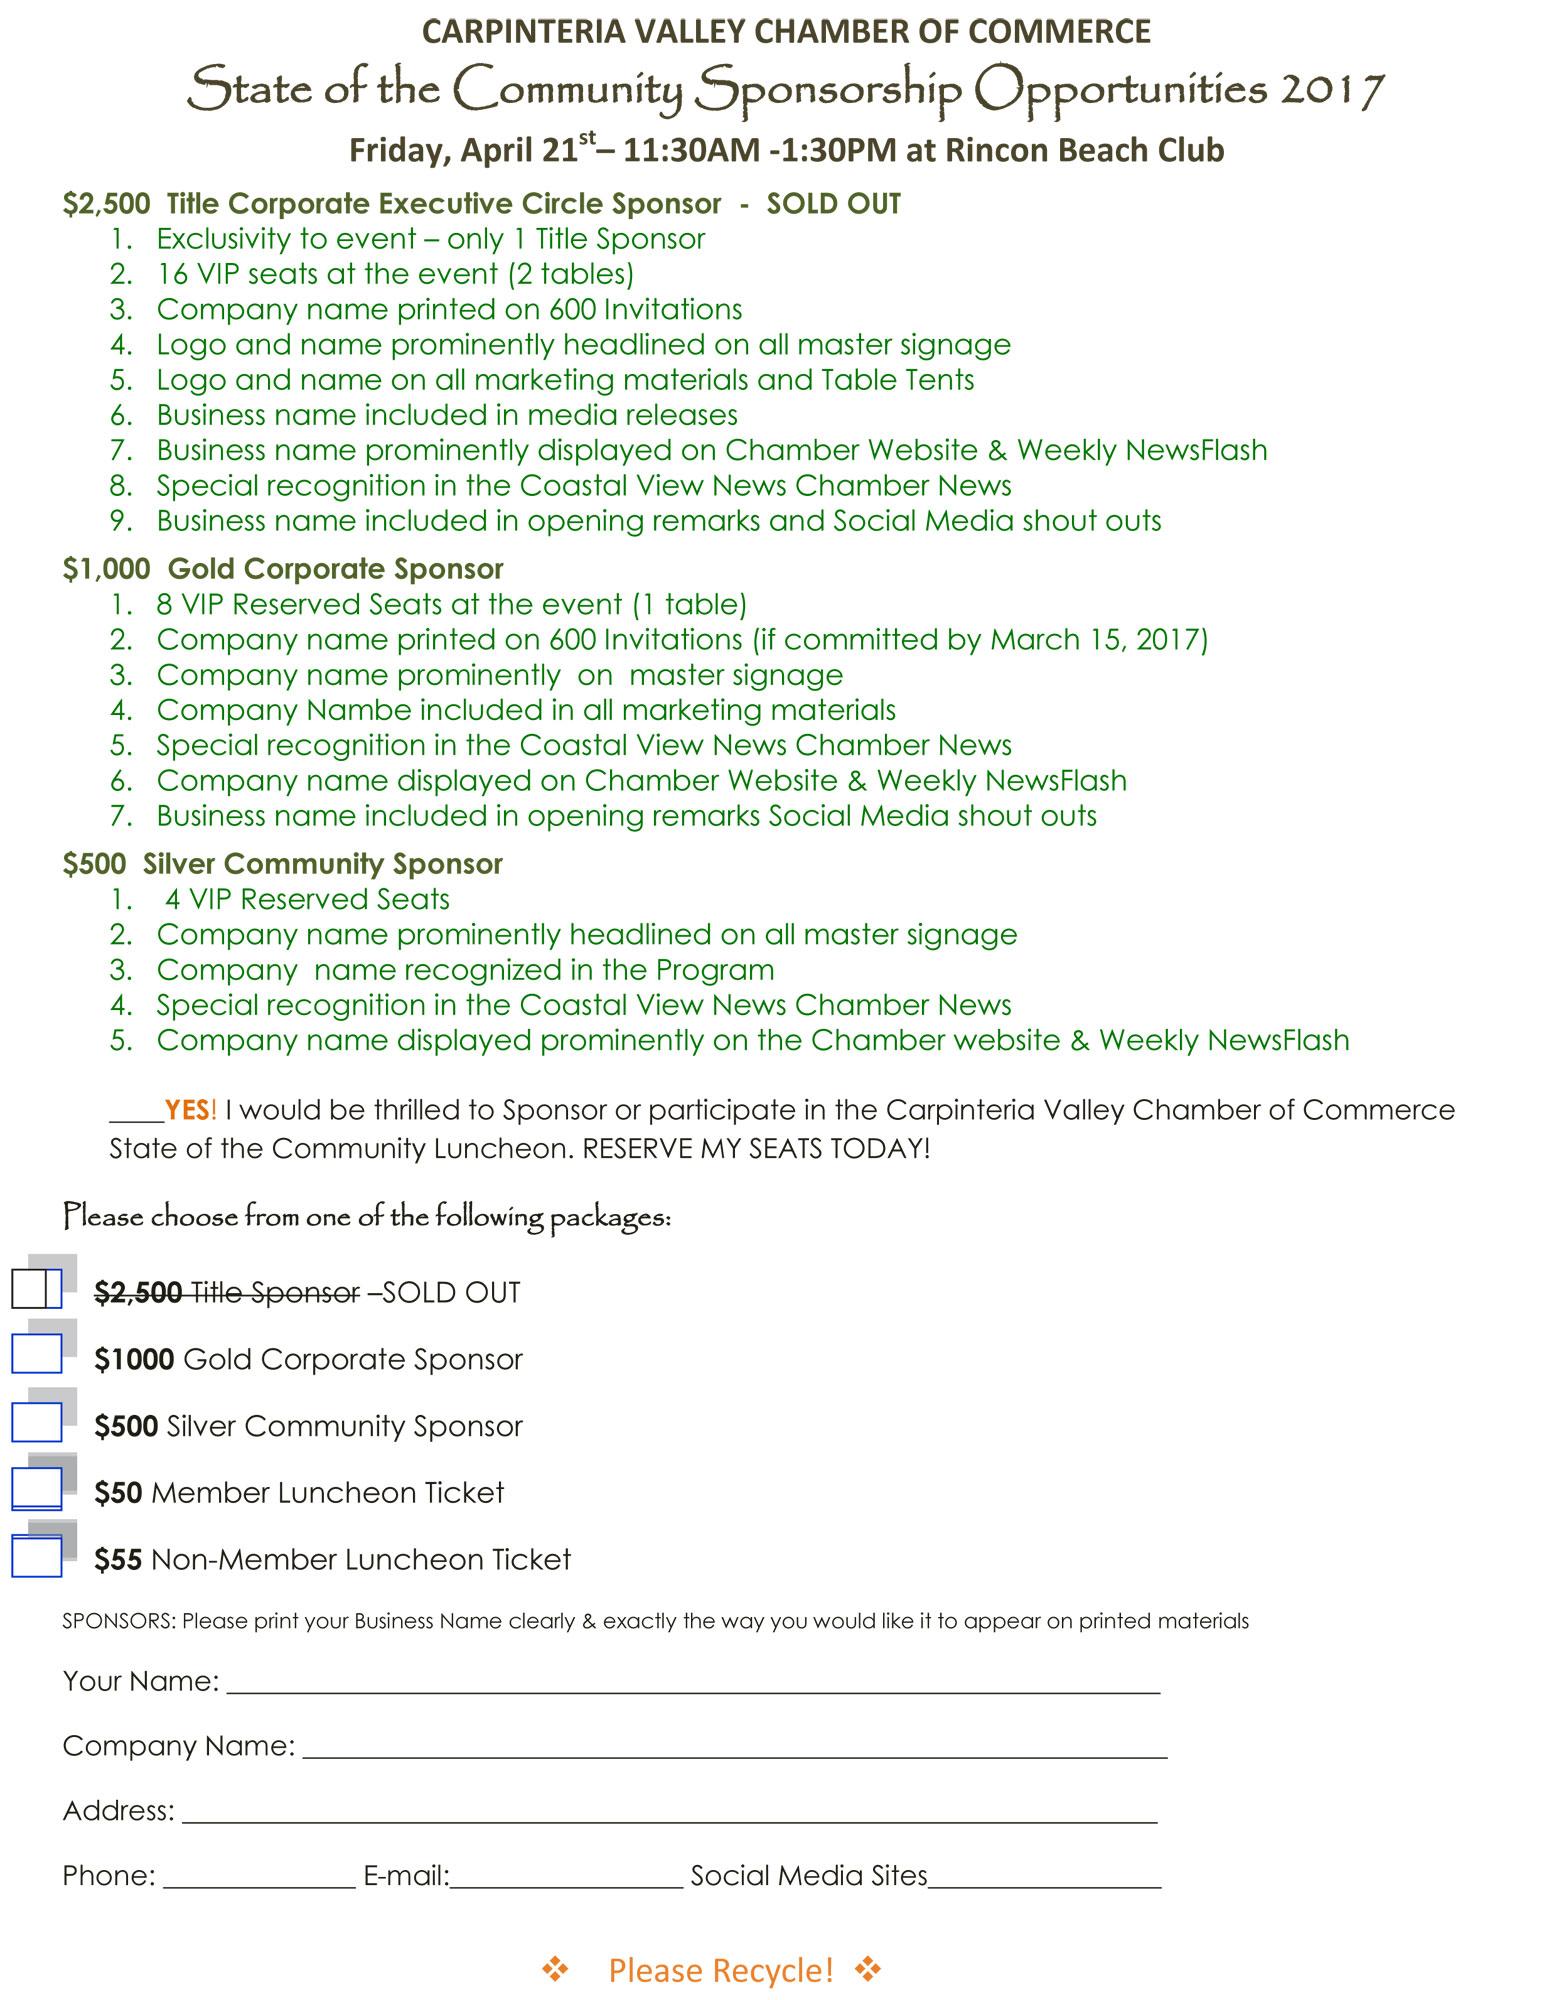 State of the Community Sponsorship pg 2